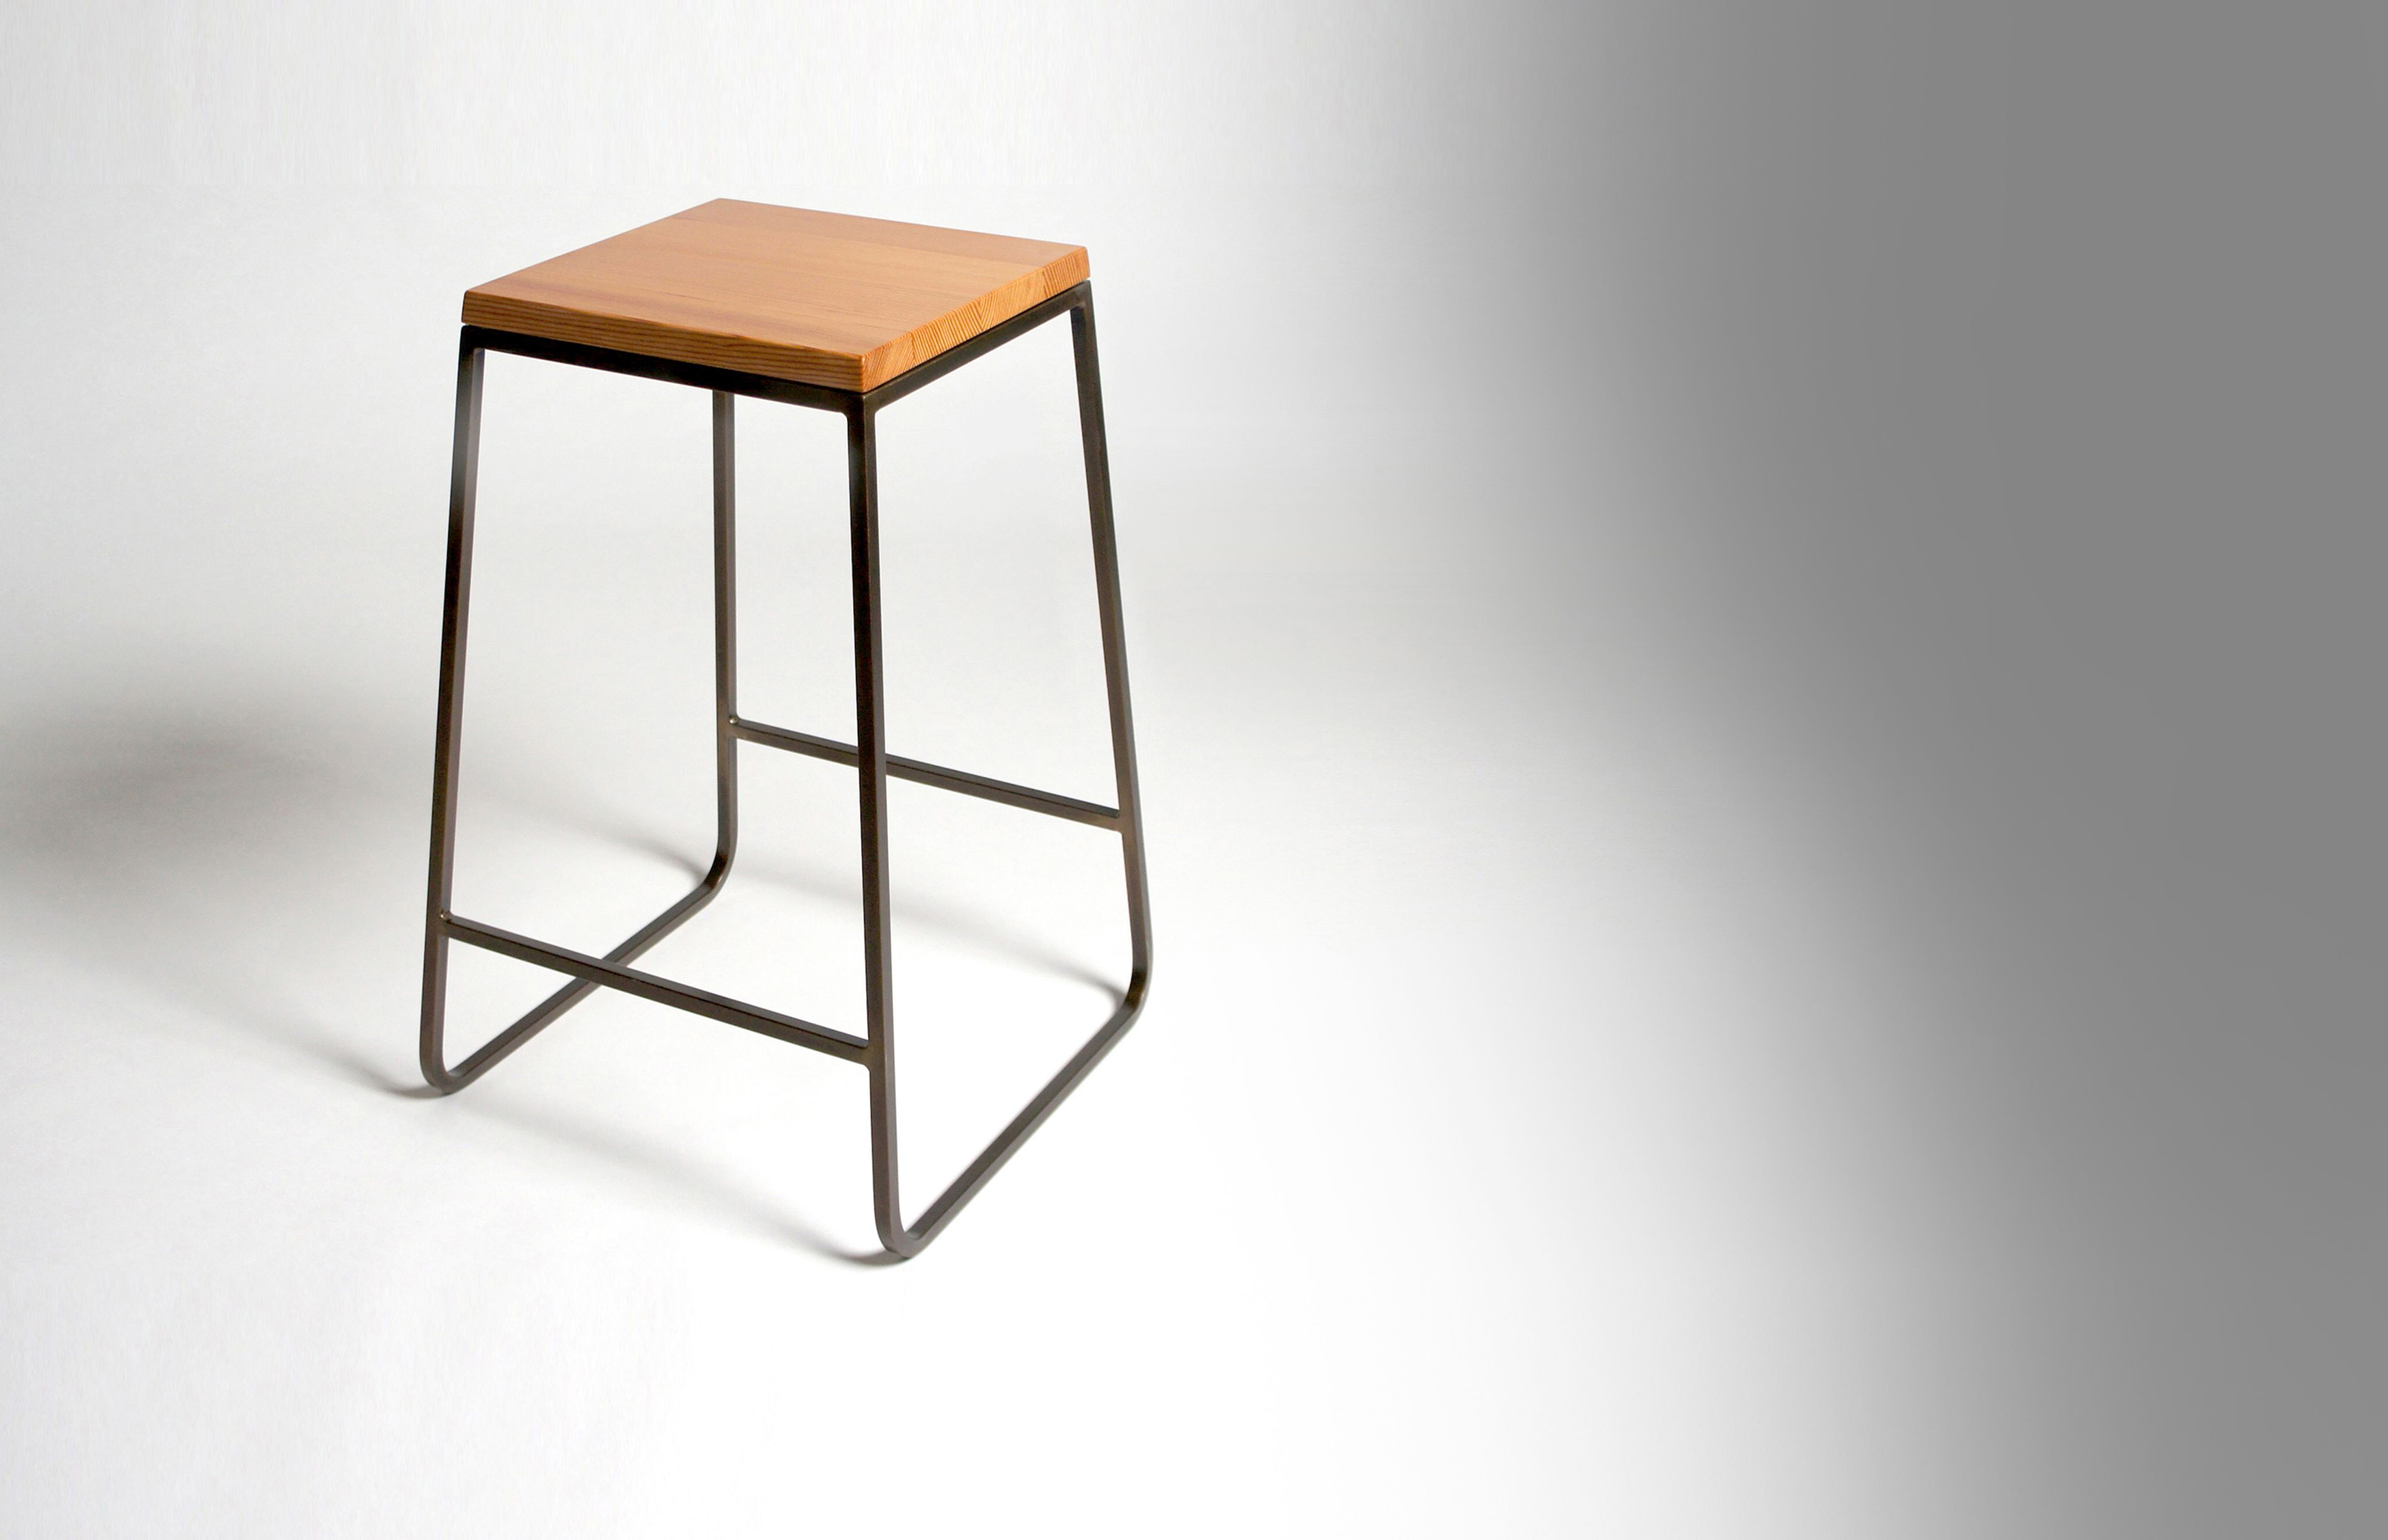 Sgabello Scaletta ~ Tuft 1703 stool stools pinterest detroit usa stools and woods